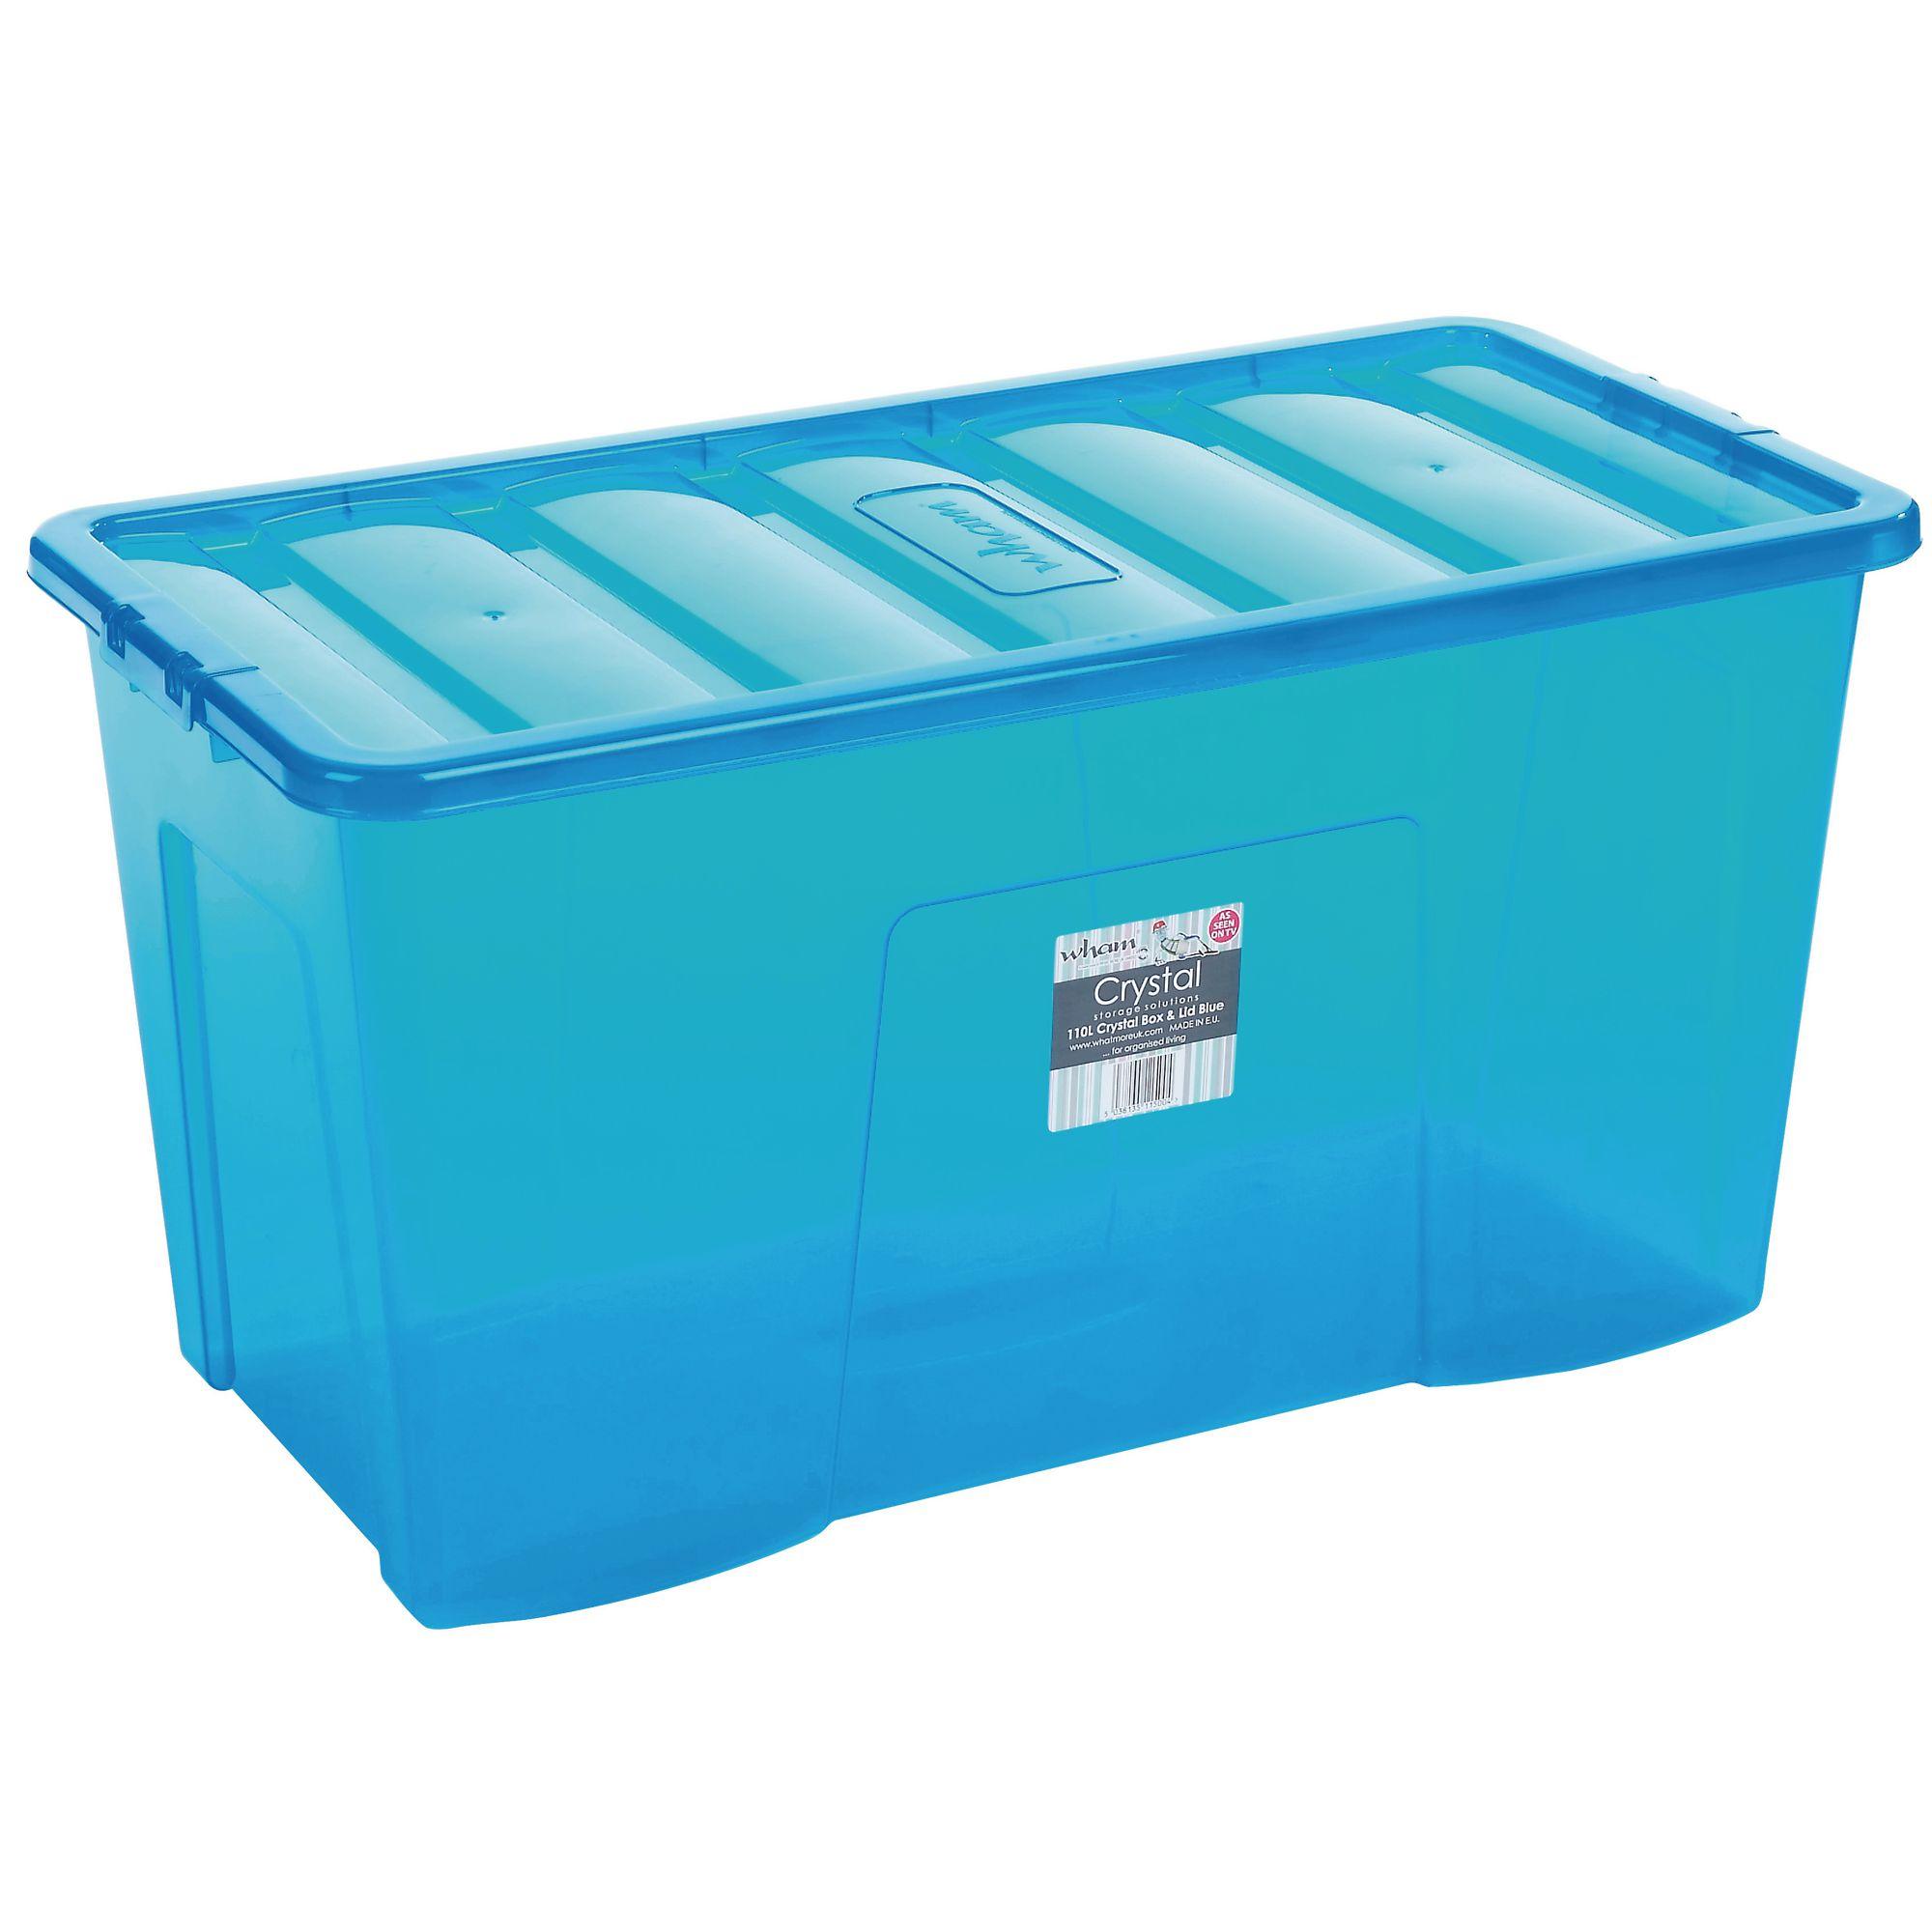 Crystal Box 110L - Blue  sc 1 st  Hope Education & Crystal Box 110L - Blue   Hope Education